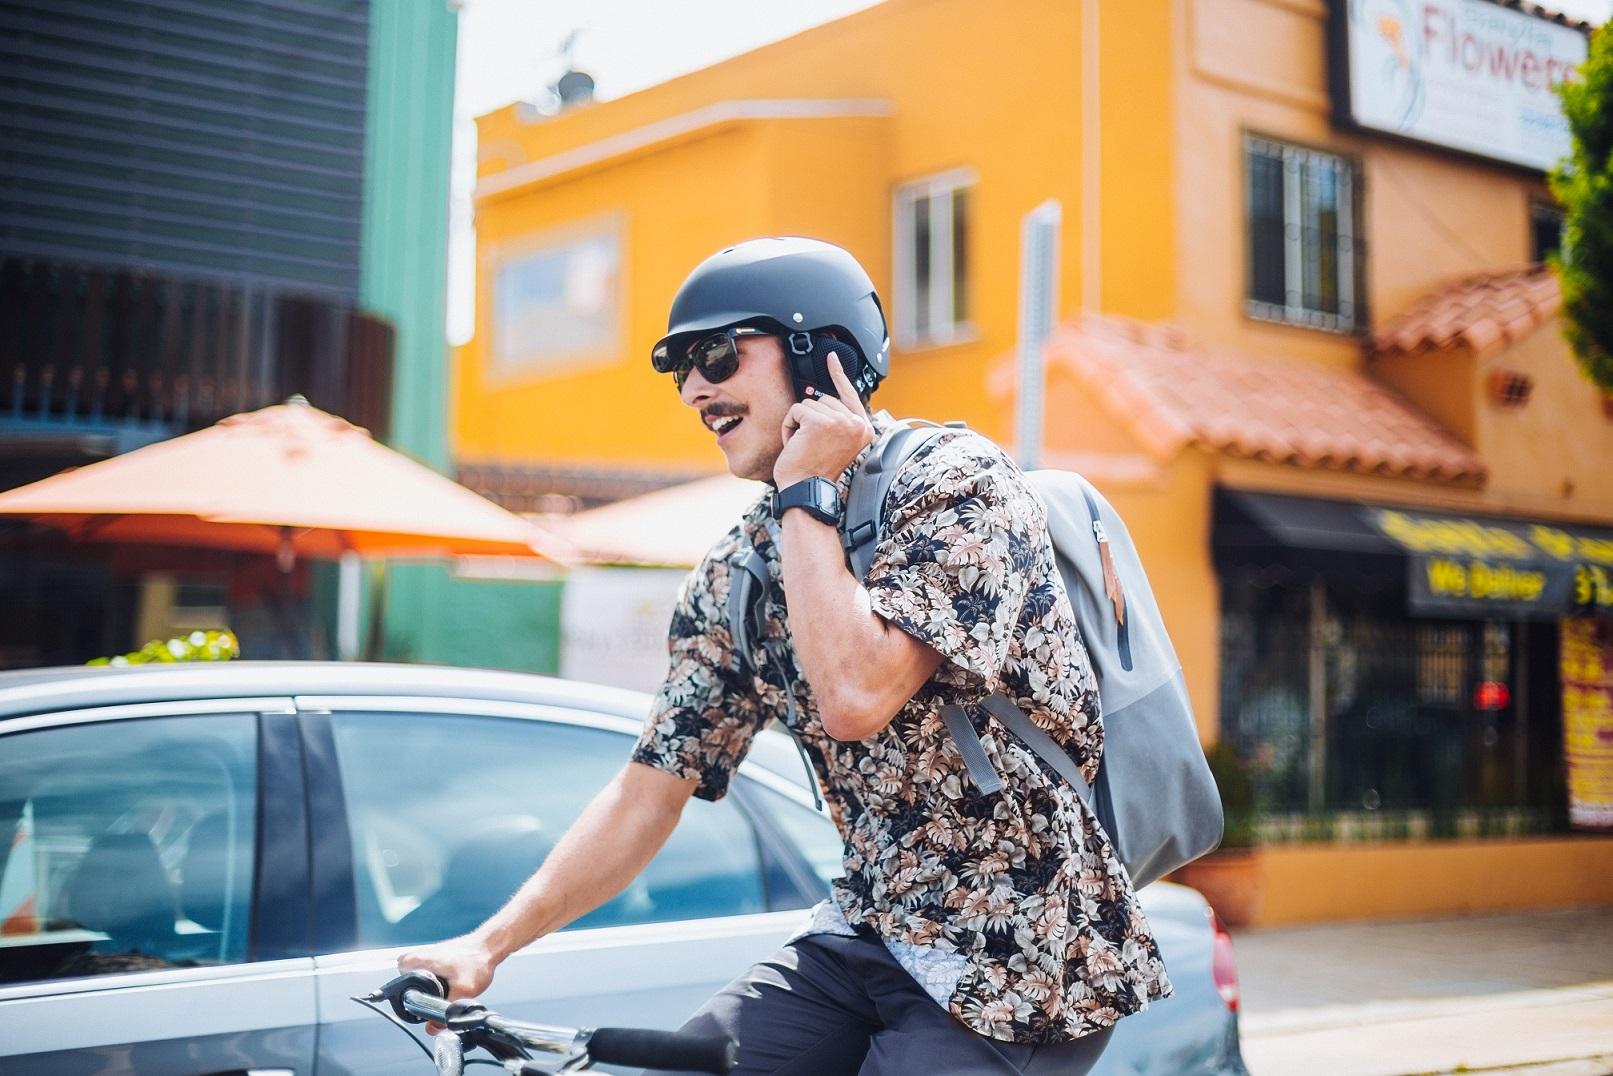 OT3830-Chips-Kroo-Commuter-Bike-Stoked-Lifestyle-2